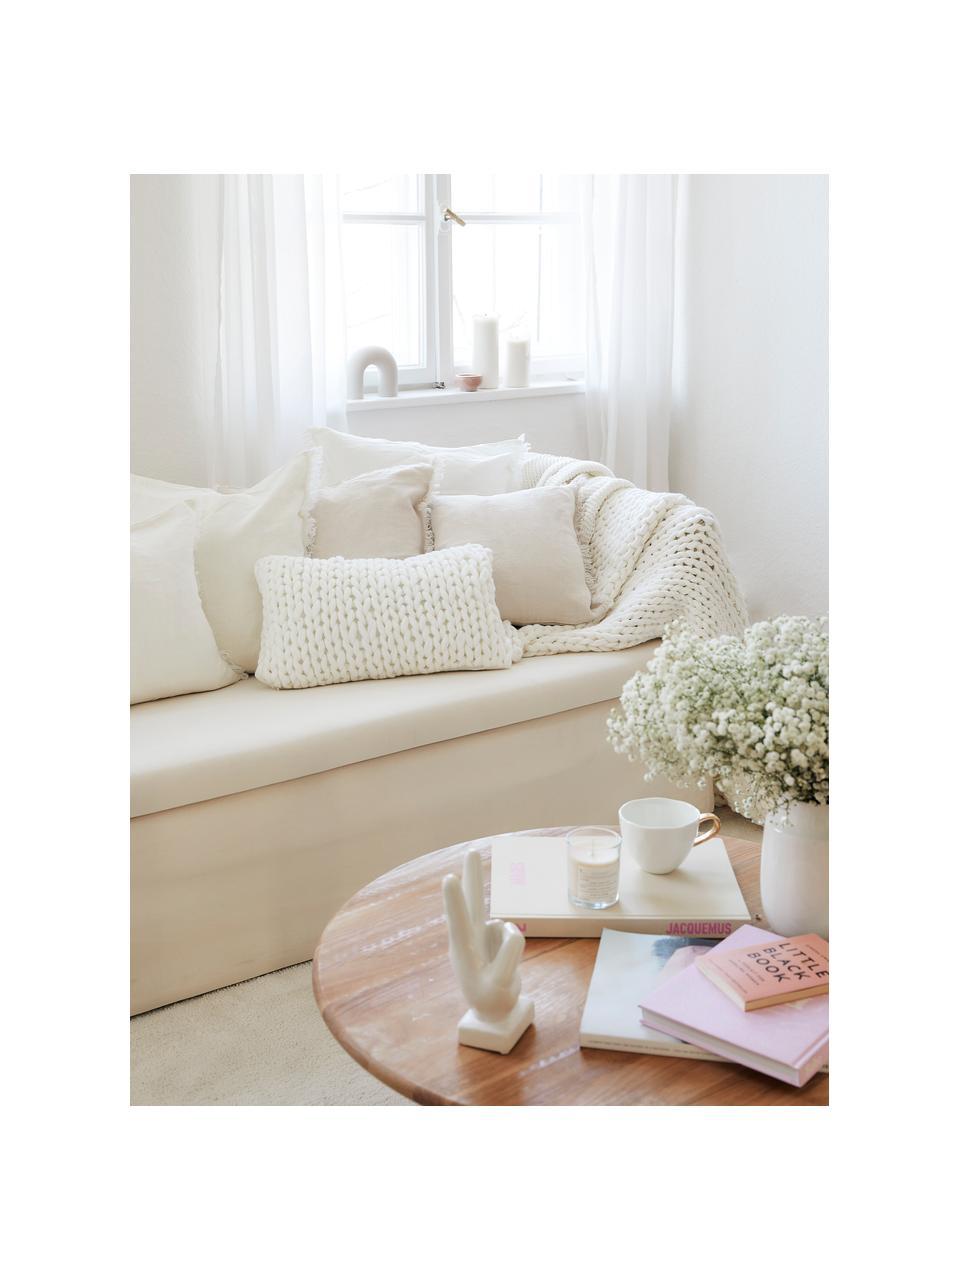 Tazza bianca con manico dorato Good Morning, Gres, Bianco, dorato, Ø 11 x Alt. 8 cm